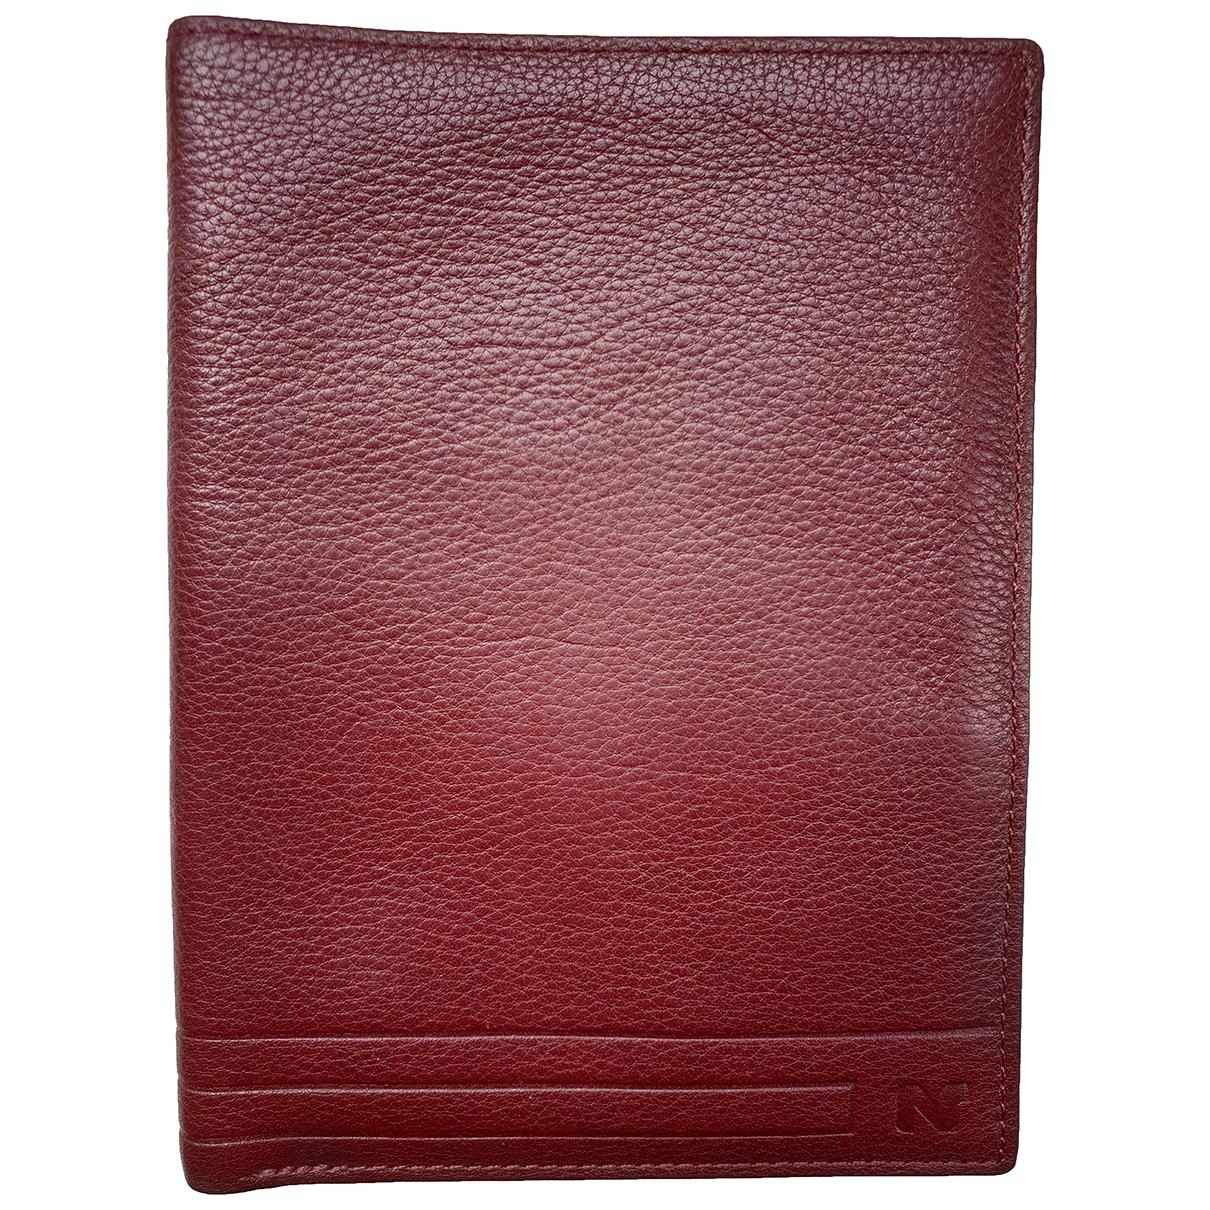 Nina Ricci \N Burgundy Leather Purses, wallet & cases for Women \N